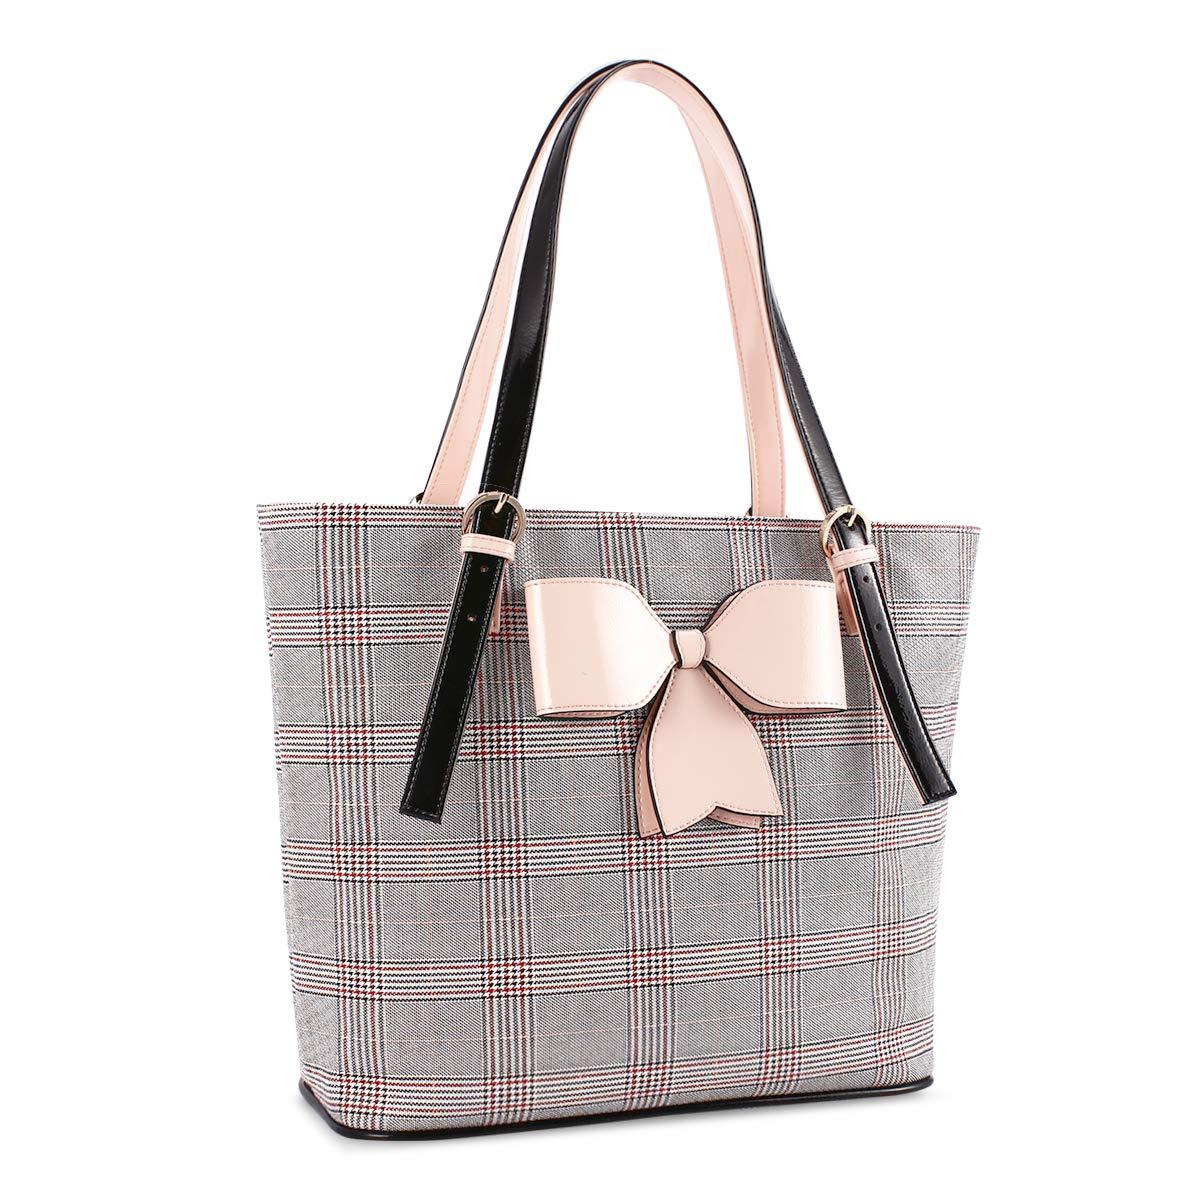 Lvtree Tote Bag Women PU Leather Fashion Shoulder Grid Handbag, Large Capacity Satchel Hobo Top Handle Purse with Pink Bowknot